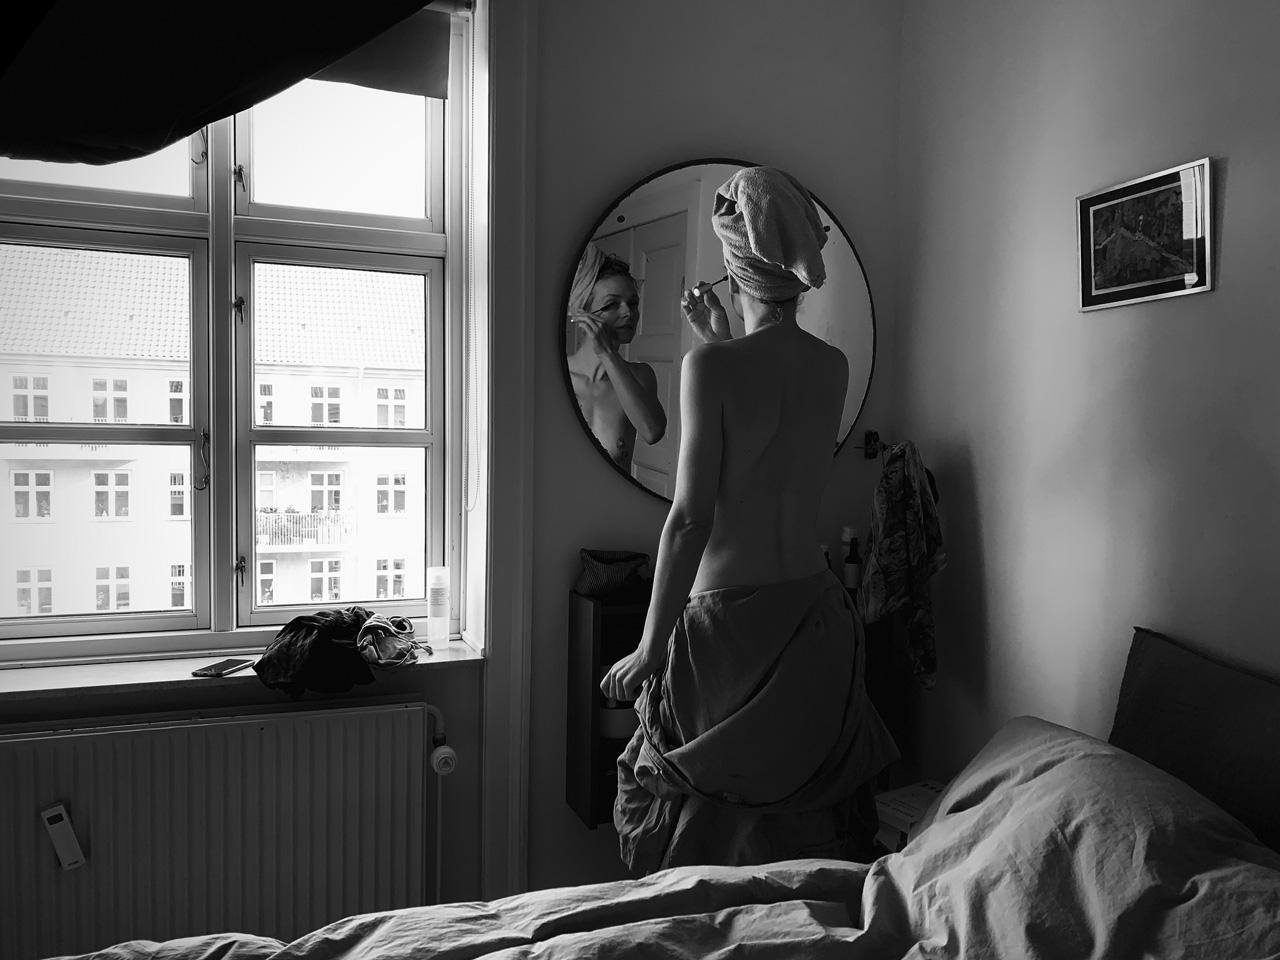 Maja's mirror 5